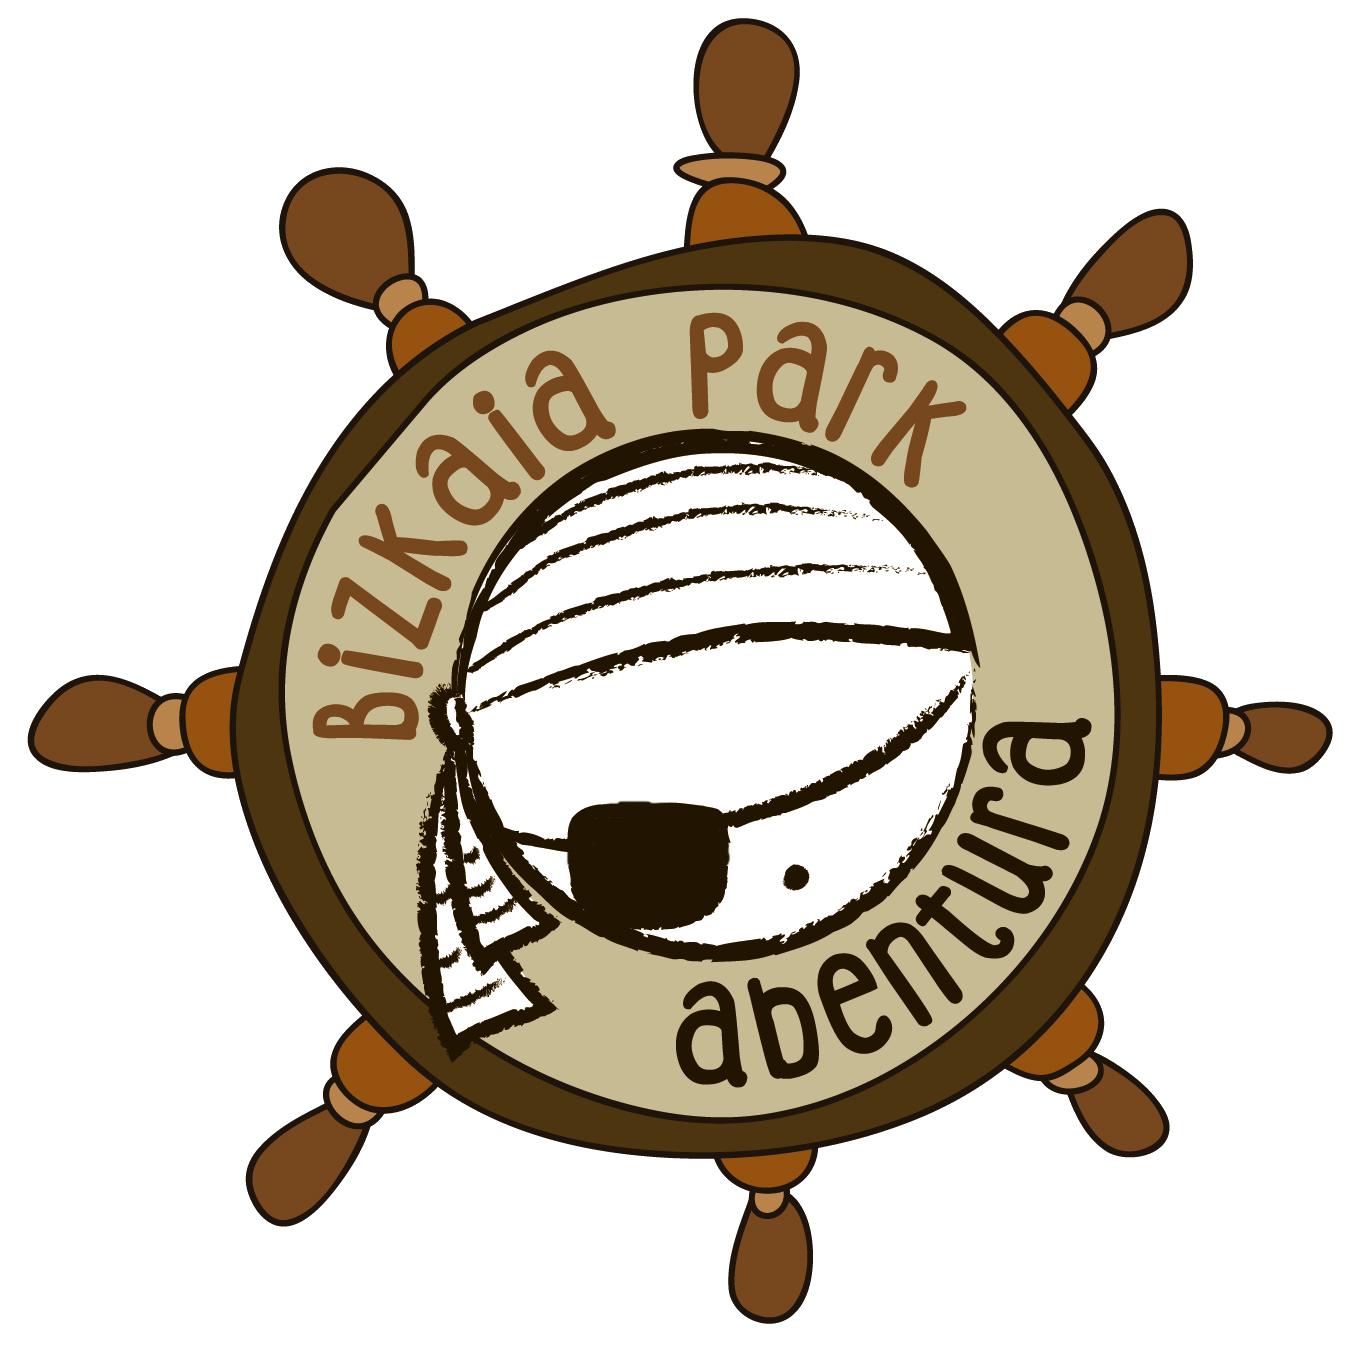 Web Bizkaia Park Abentura